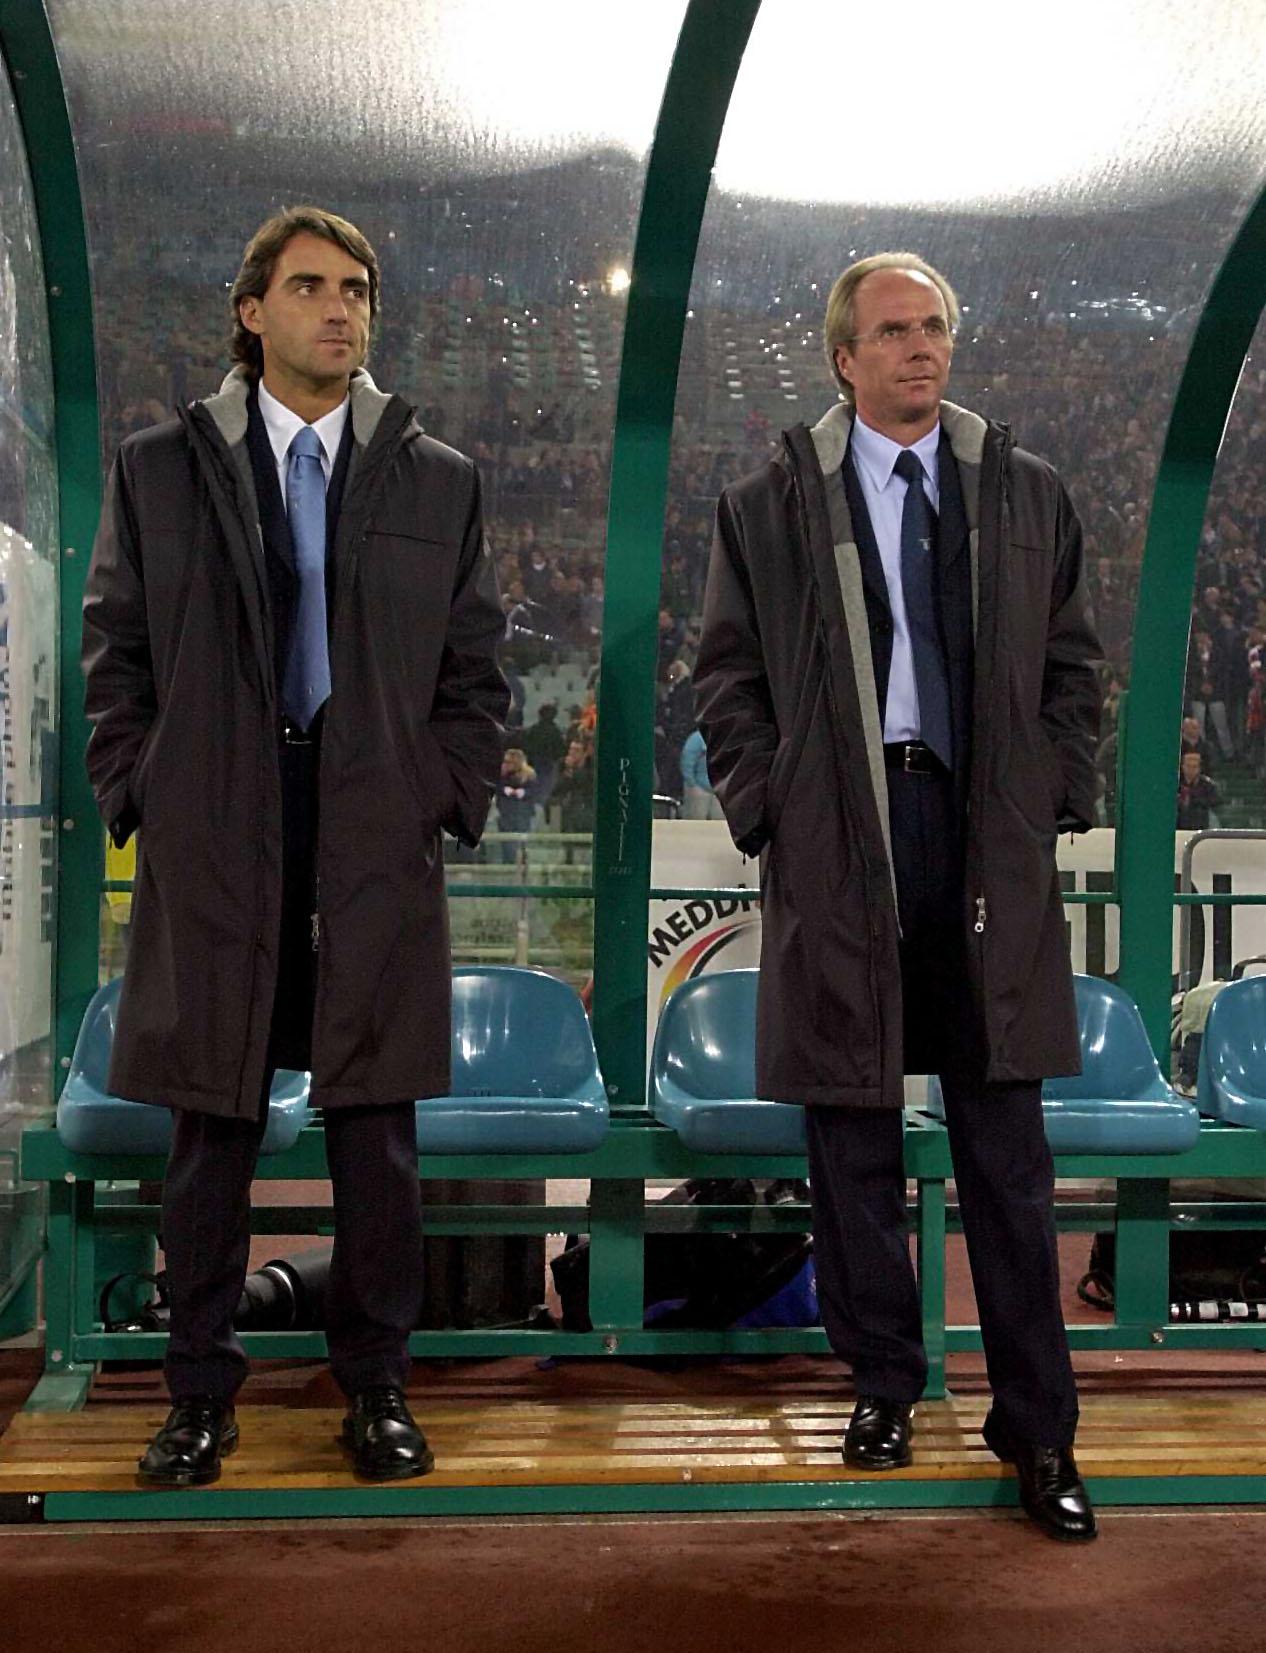 Mancini assisted Sven Goran Eriksson at Lazio.